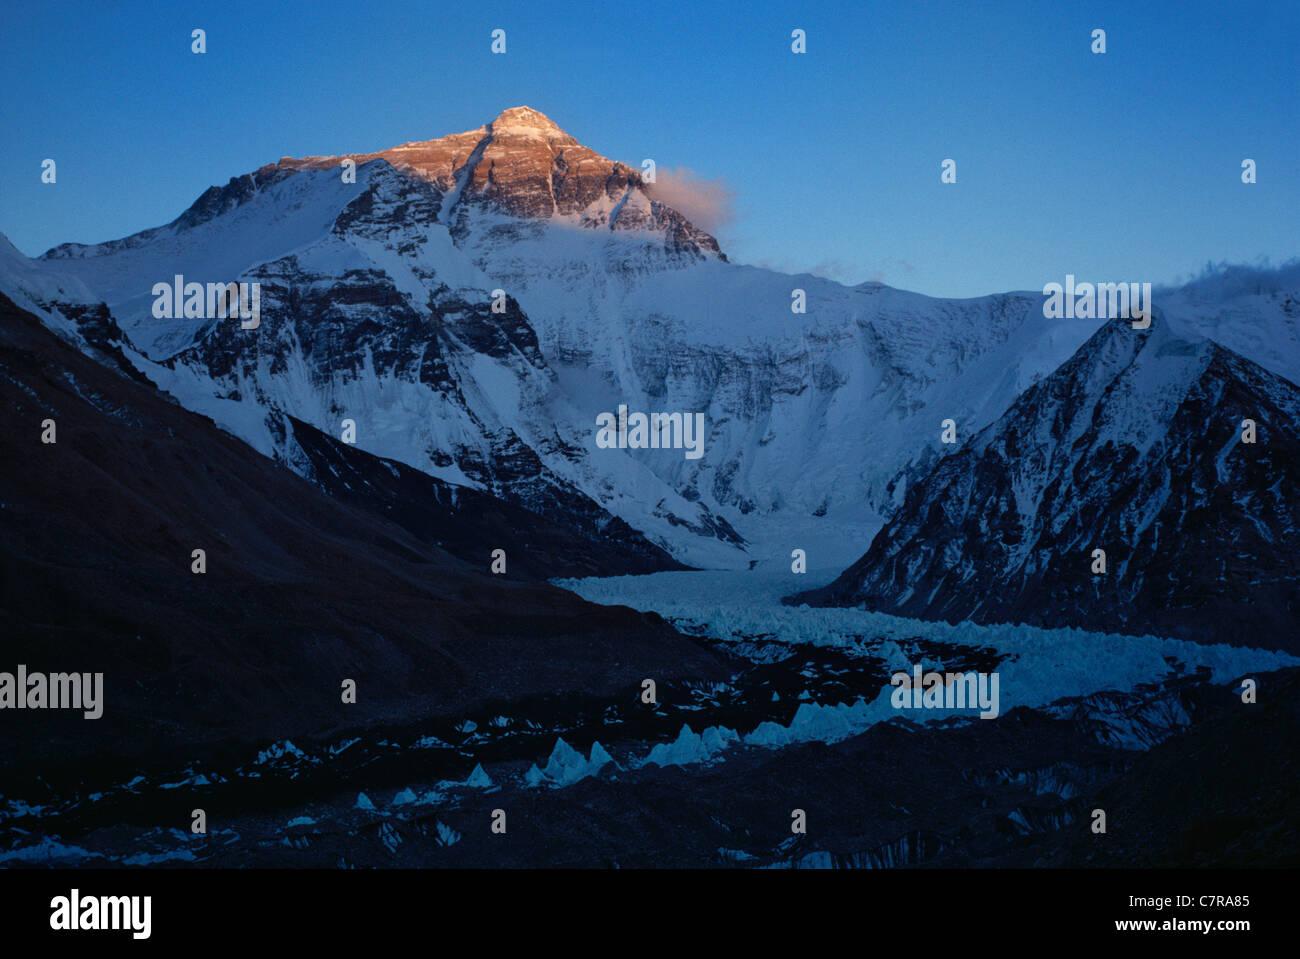 Mt. Everest and Rongbuk Glacier, Tibet, China - Stock Image